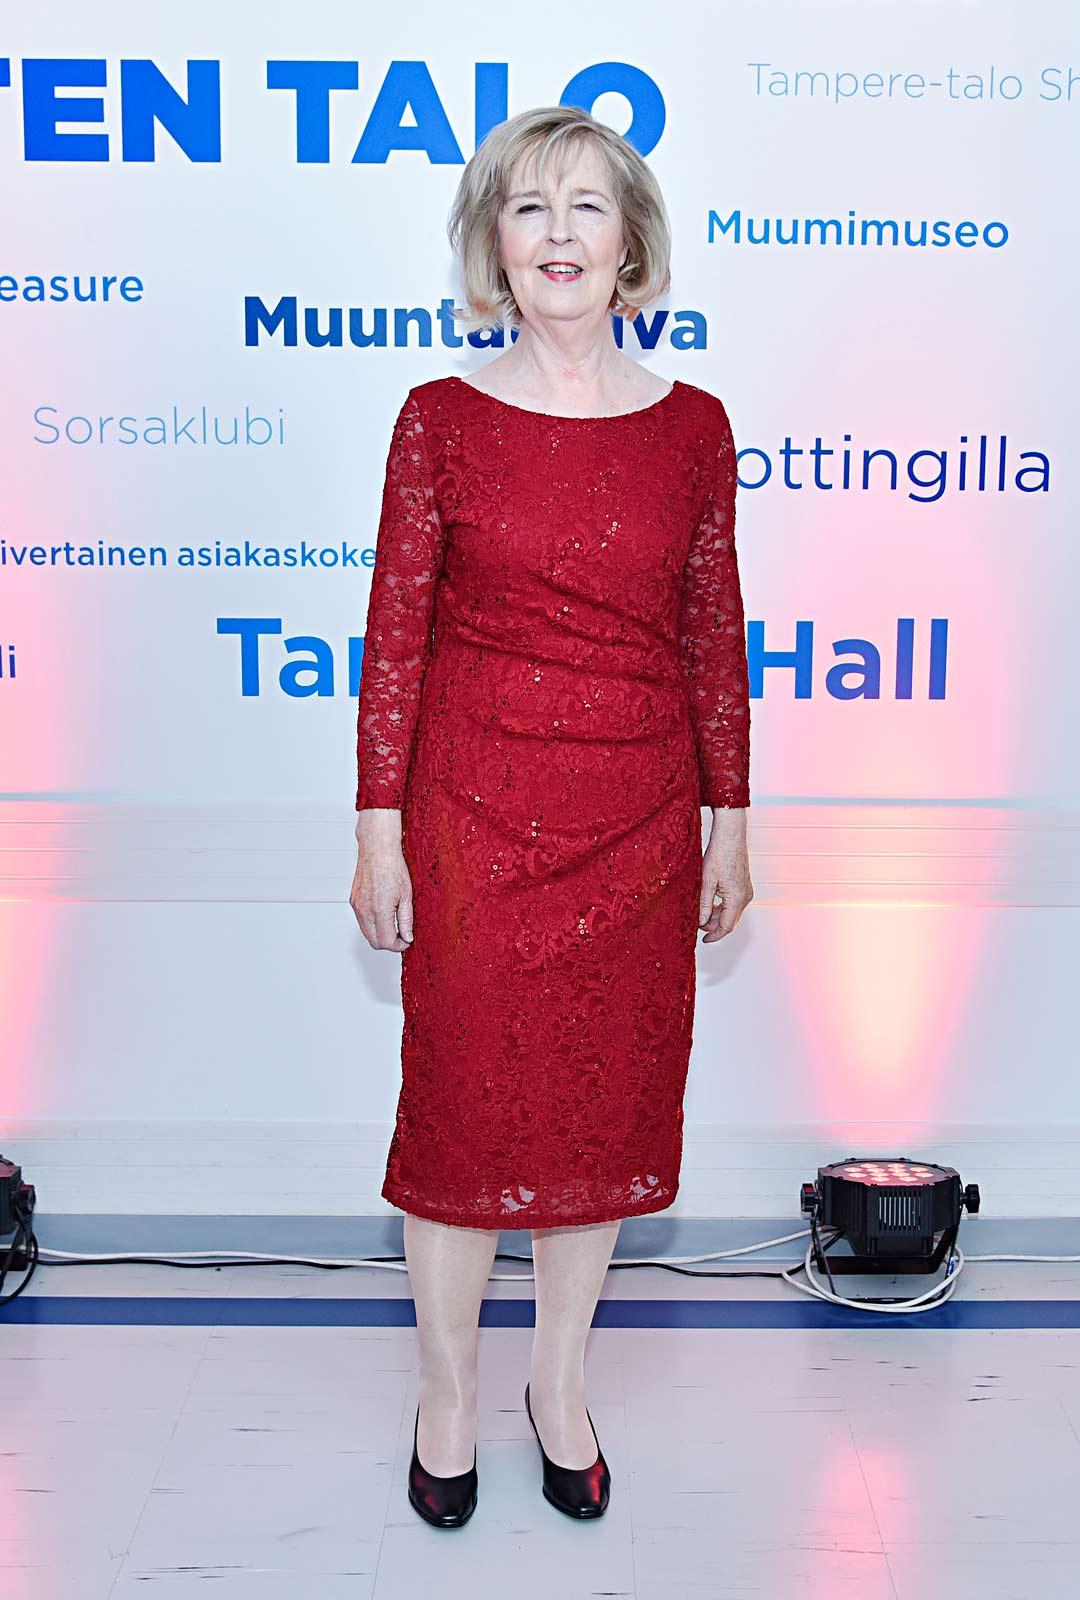 Leena Uotila punaisessa puvussa.